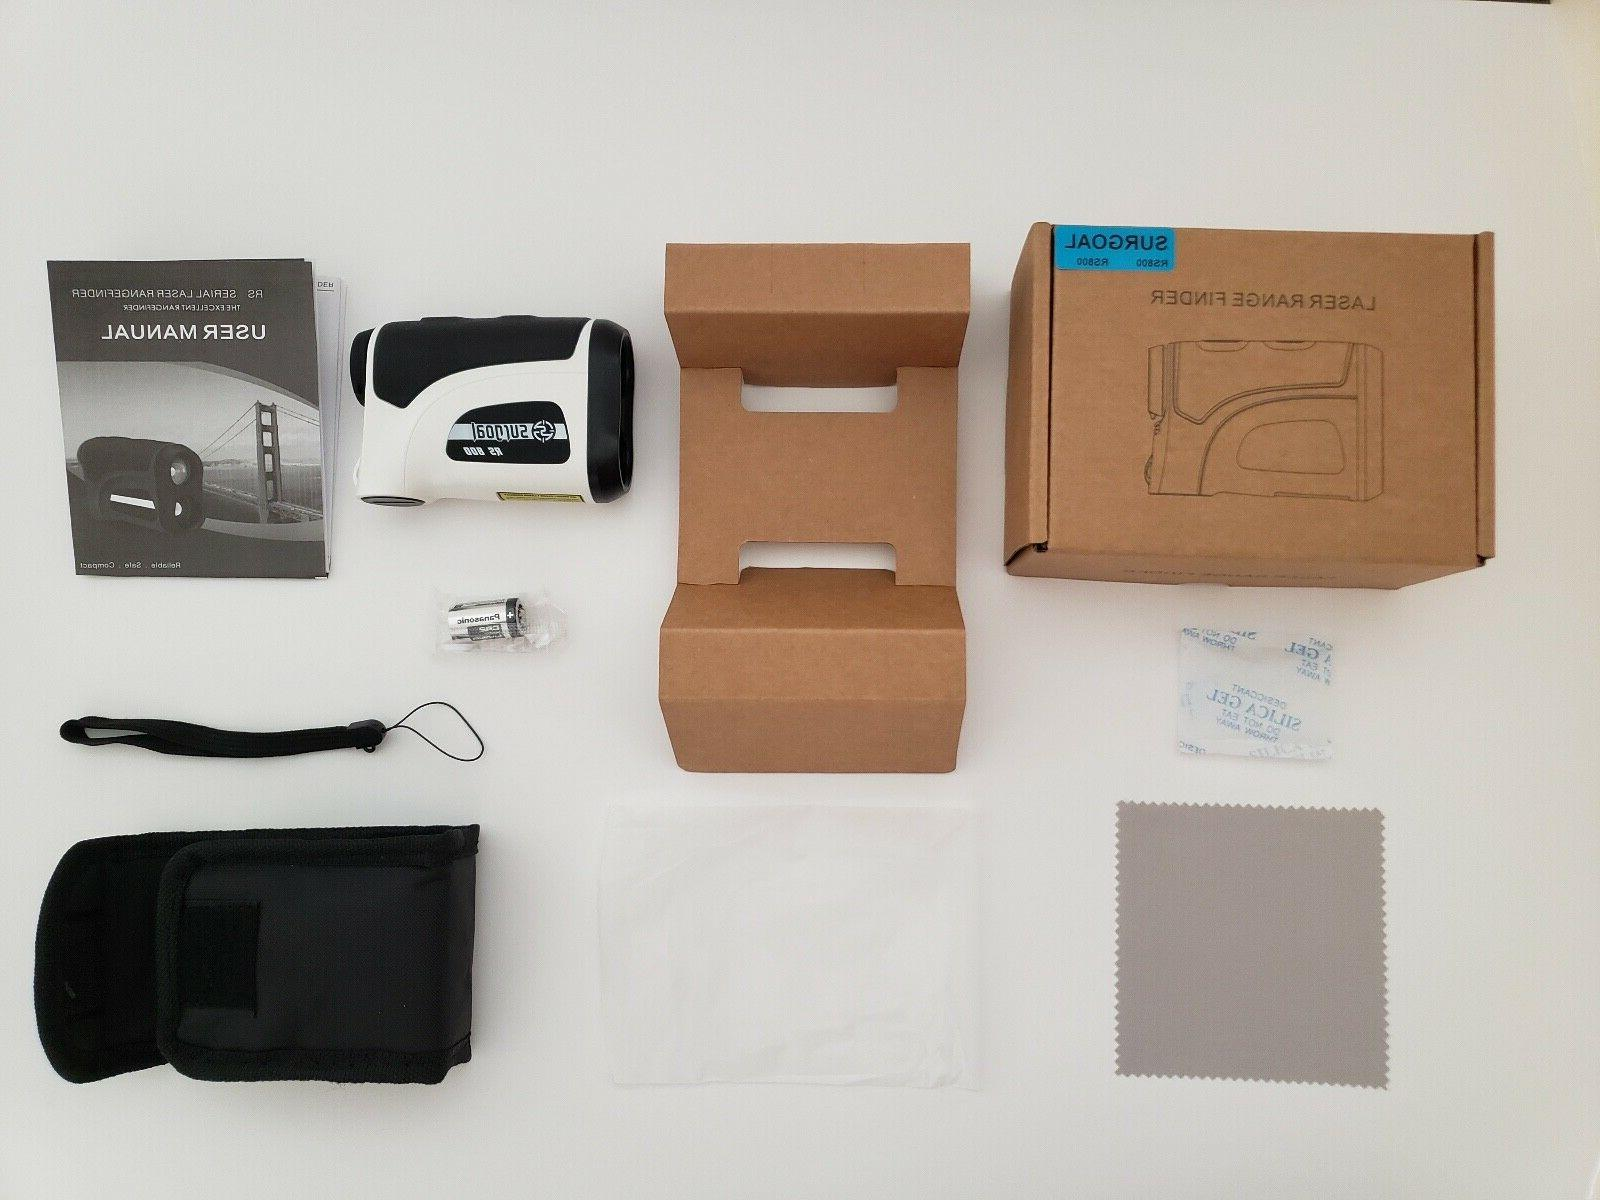 Surgoal HD 6X-Mag Golf Laser Rangefinder Waterproof_All